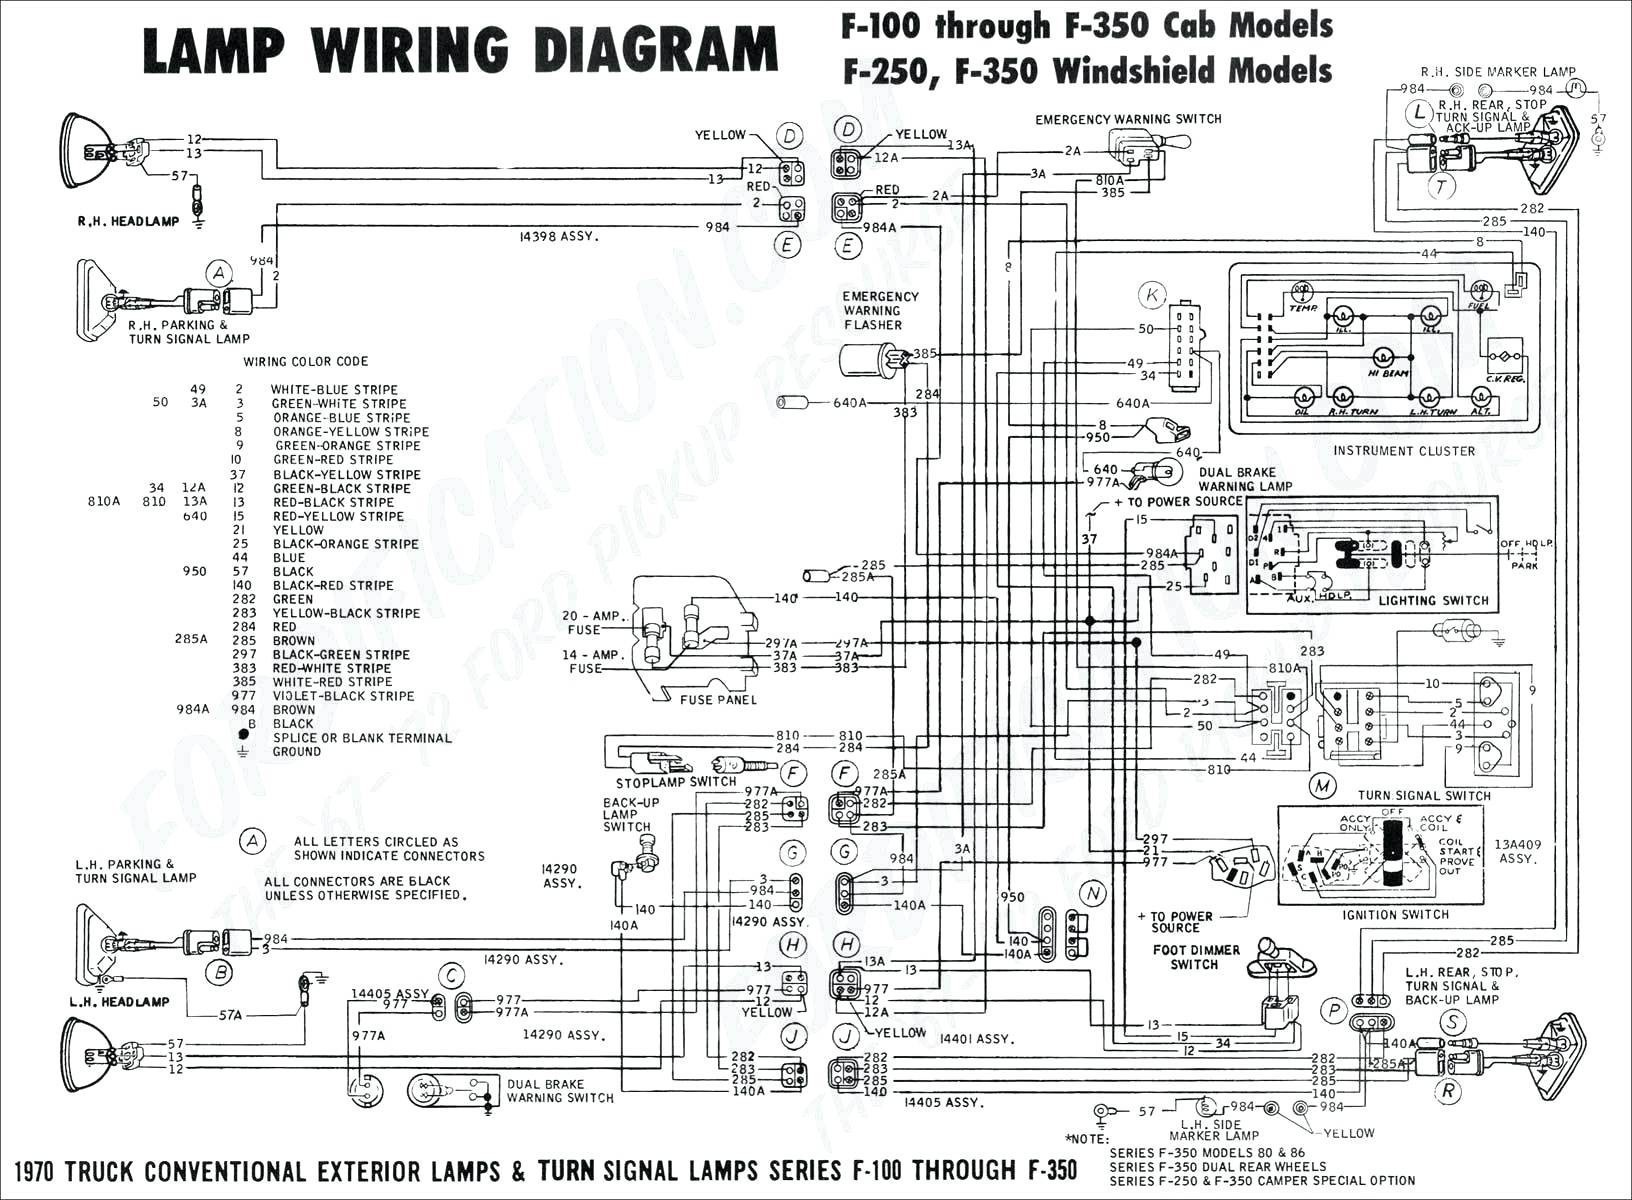 V8 Engine Parts Diagram 2001 F250 Engine Diagram Experts Wiring Diagram • Of V8 Engine Parts Diagram